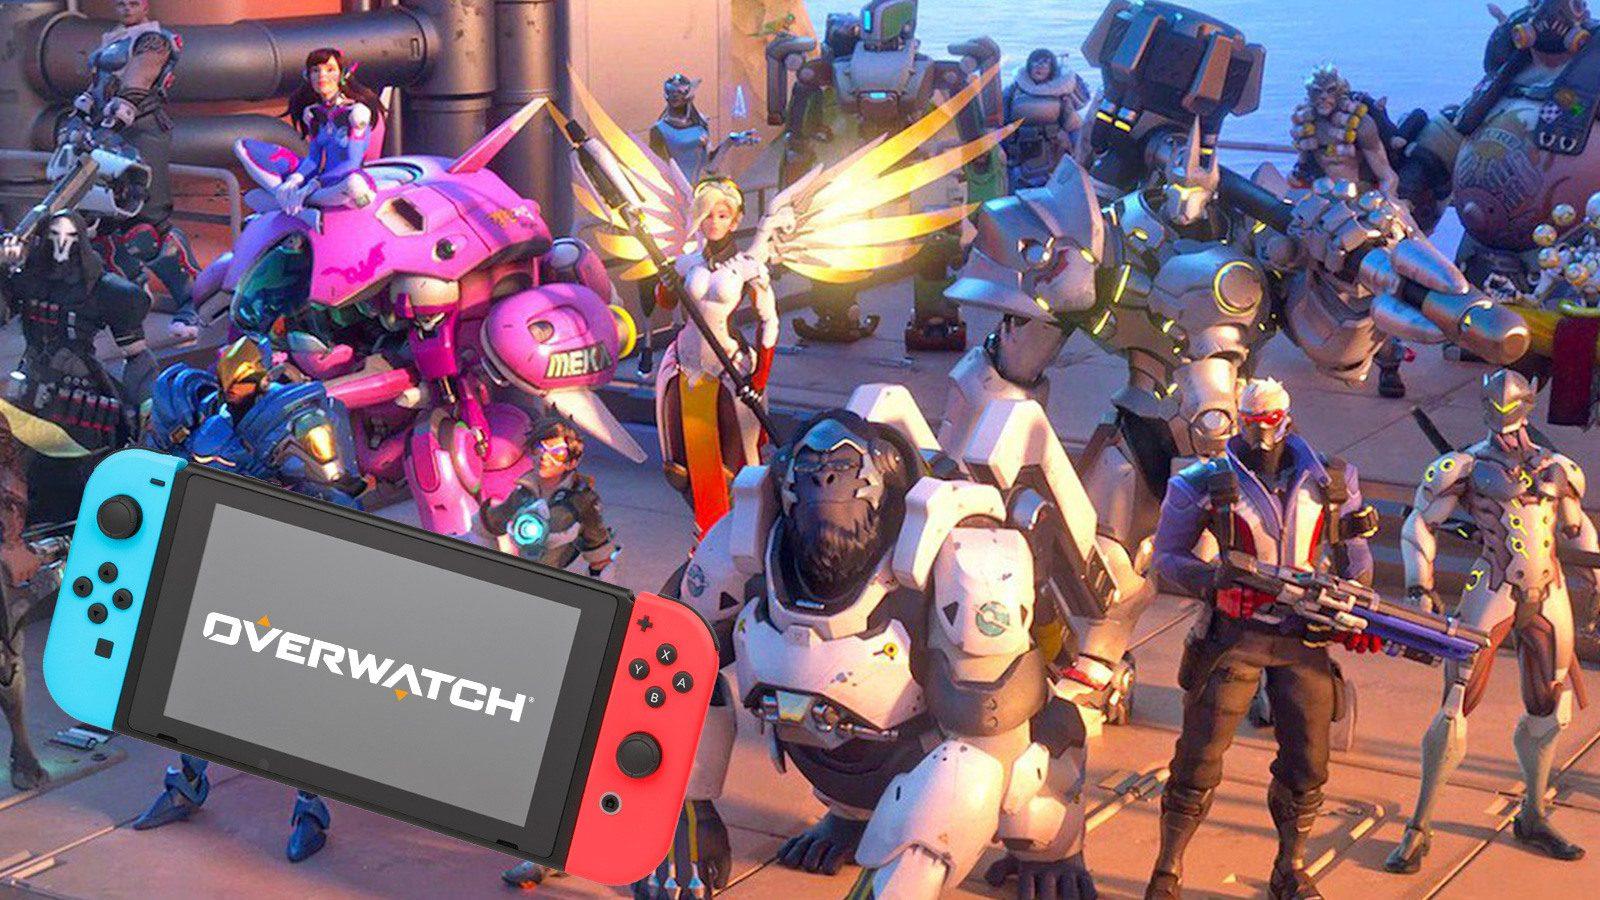 overwatch fps resolutioncross platform play teased - ギスギスオンラインFPS『オーバーウォッチ』、30fps/720pでスイッチで発売へ